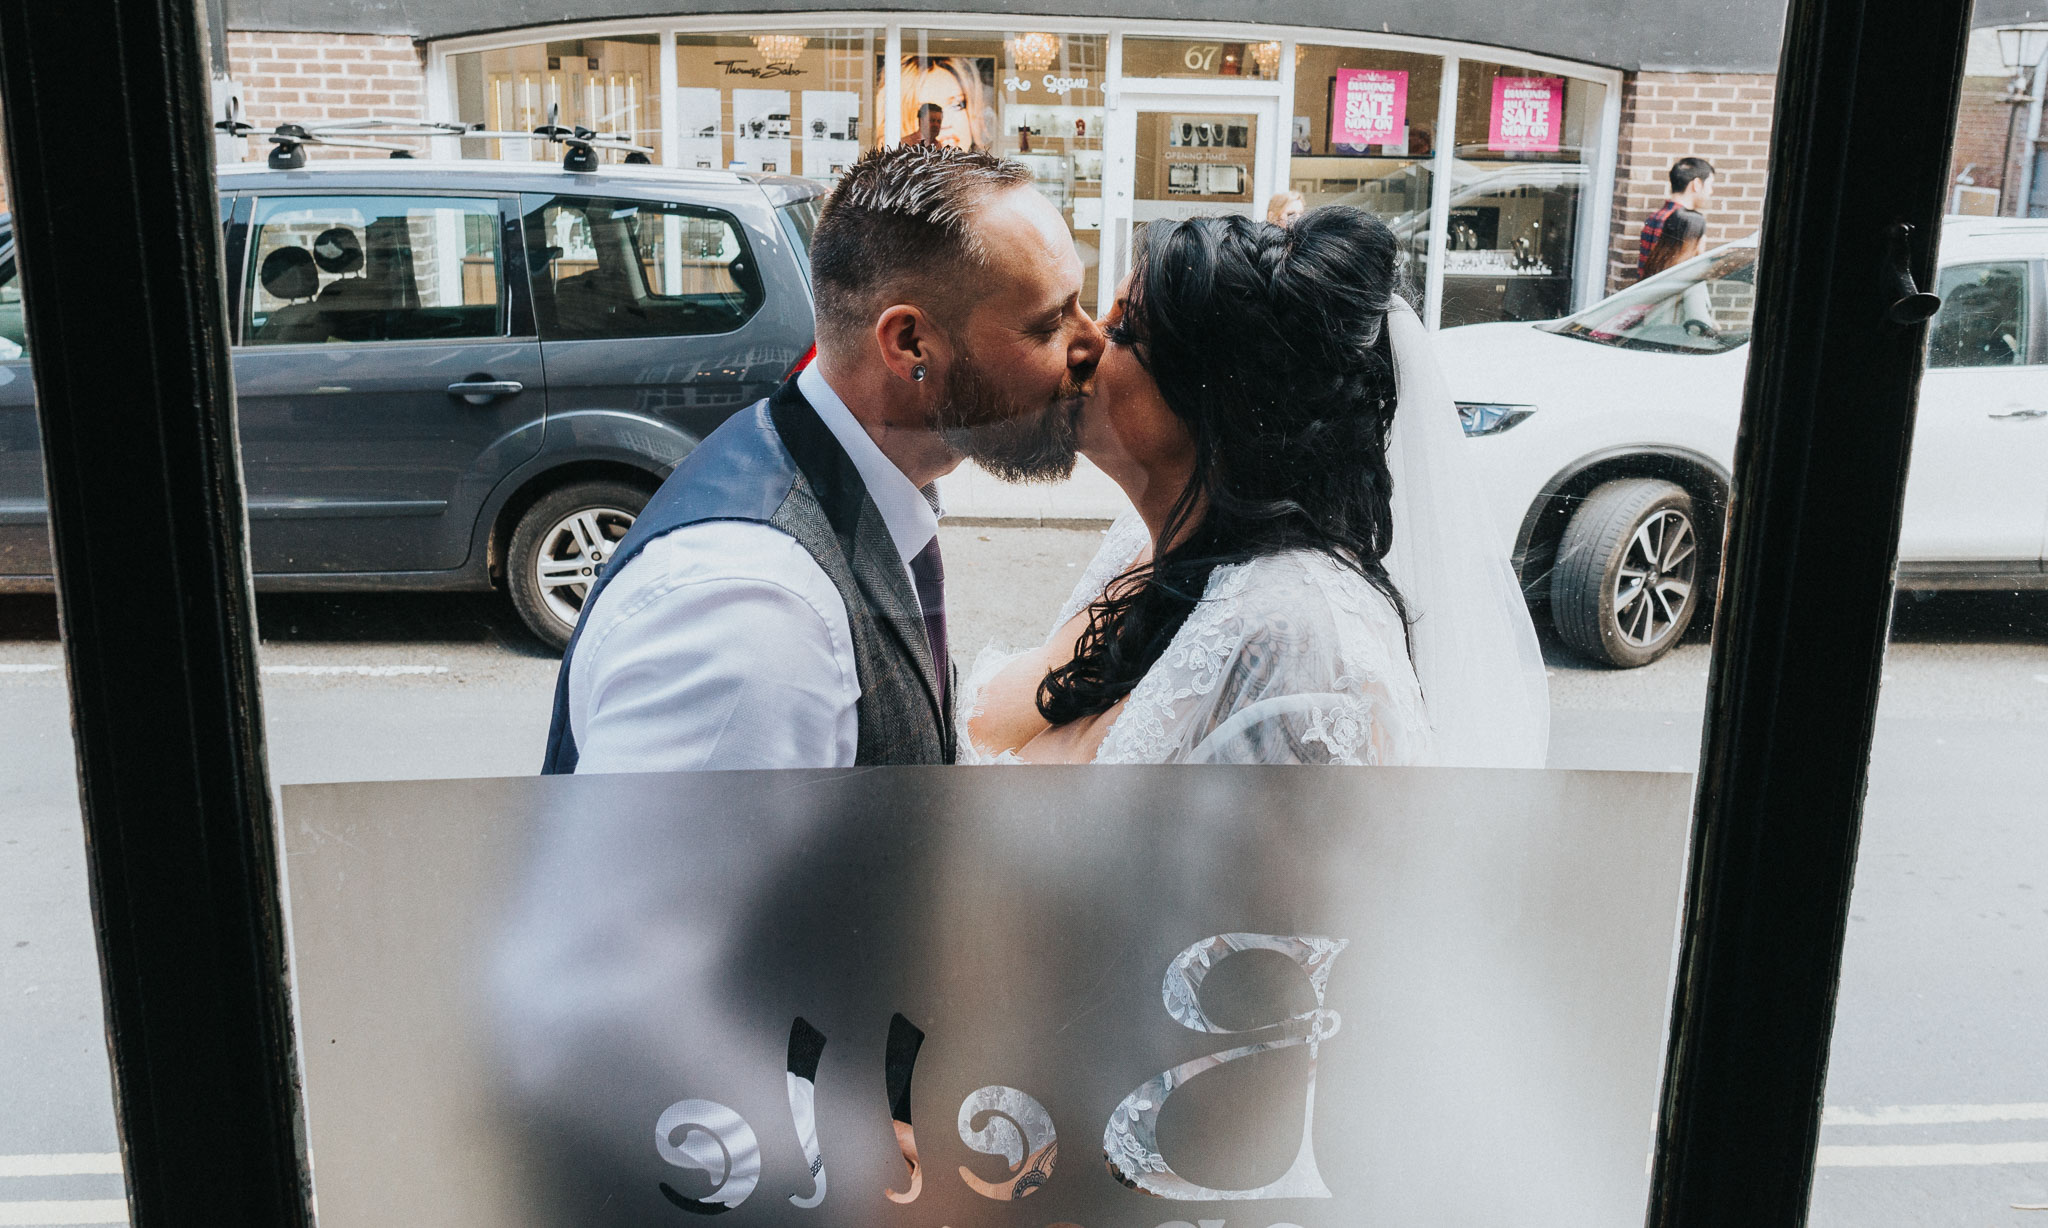 fun-wedding-photography-at-the-belle-epoque-knutsford-wedding-photographer (7).jpg